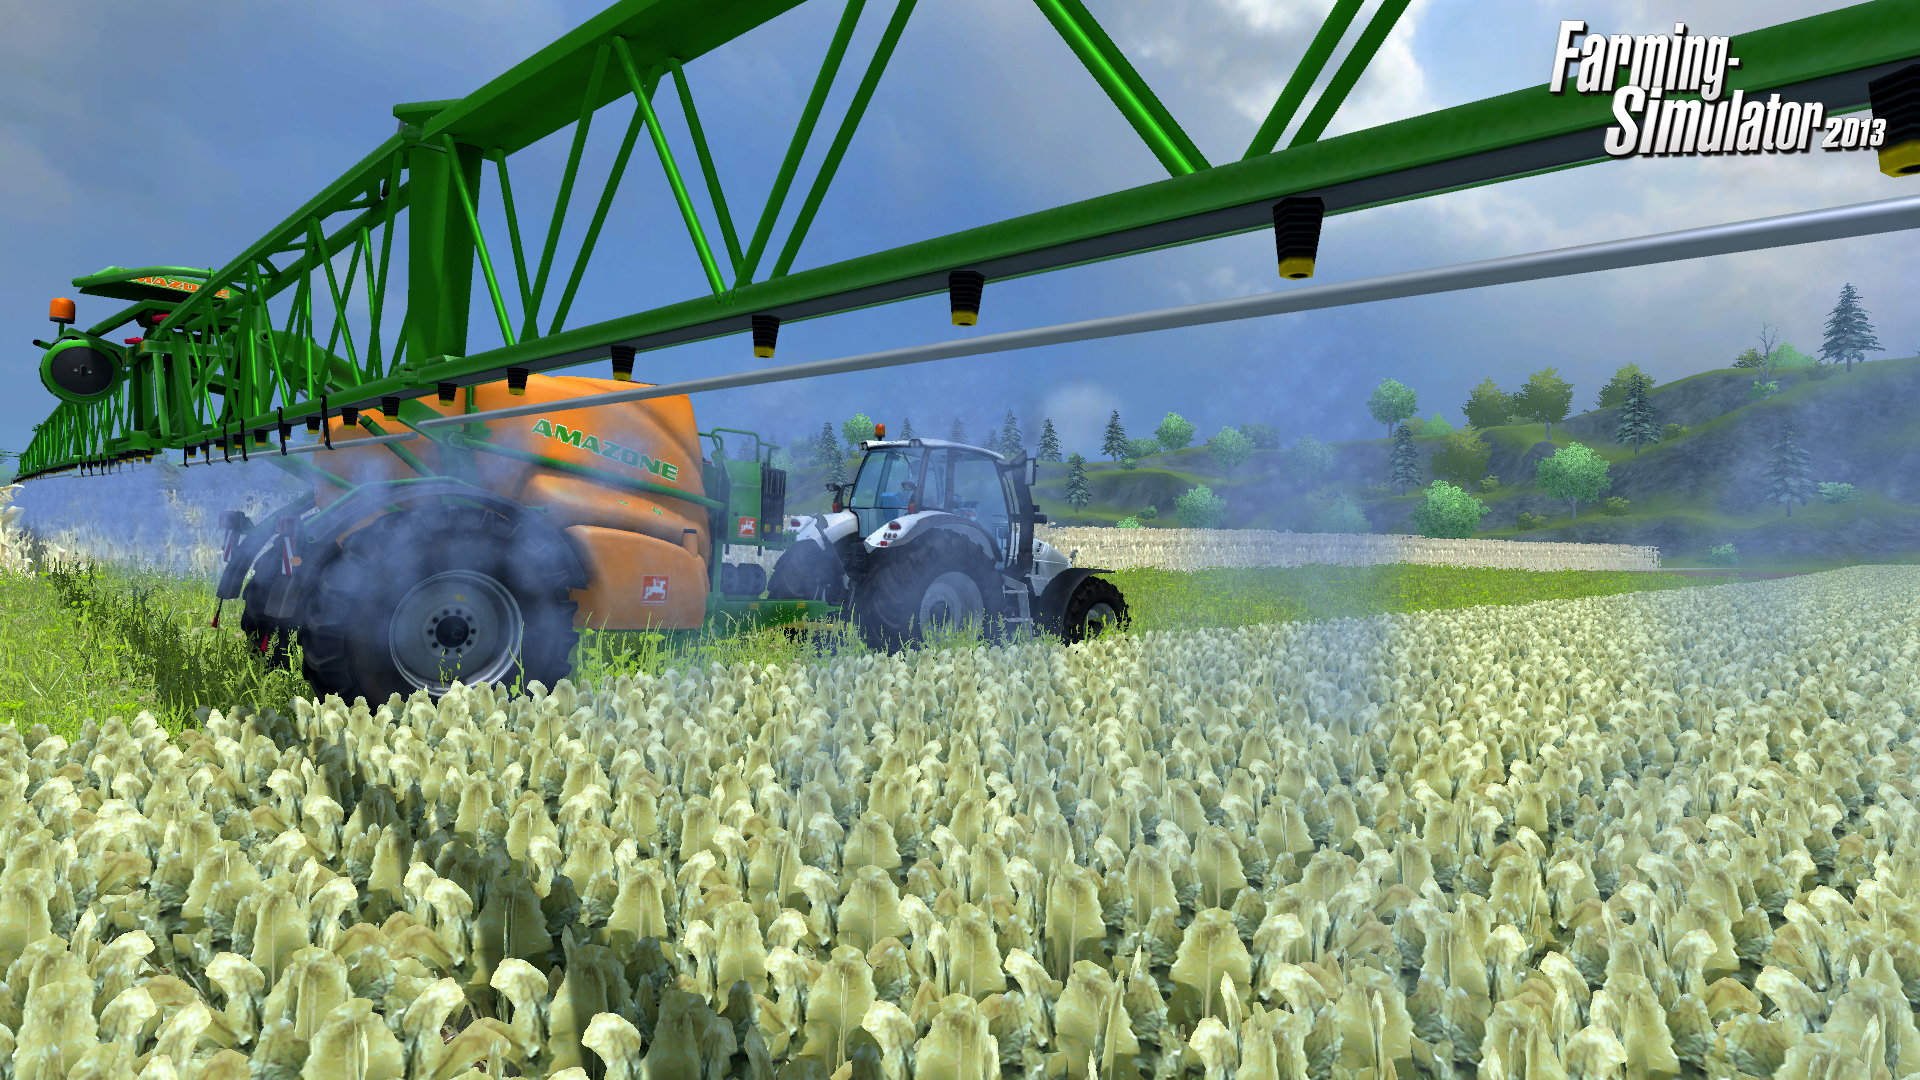 Landwirtschafts-Simulator-xbox-review-nat-games-2